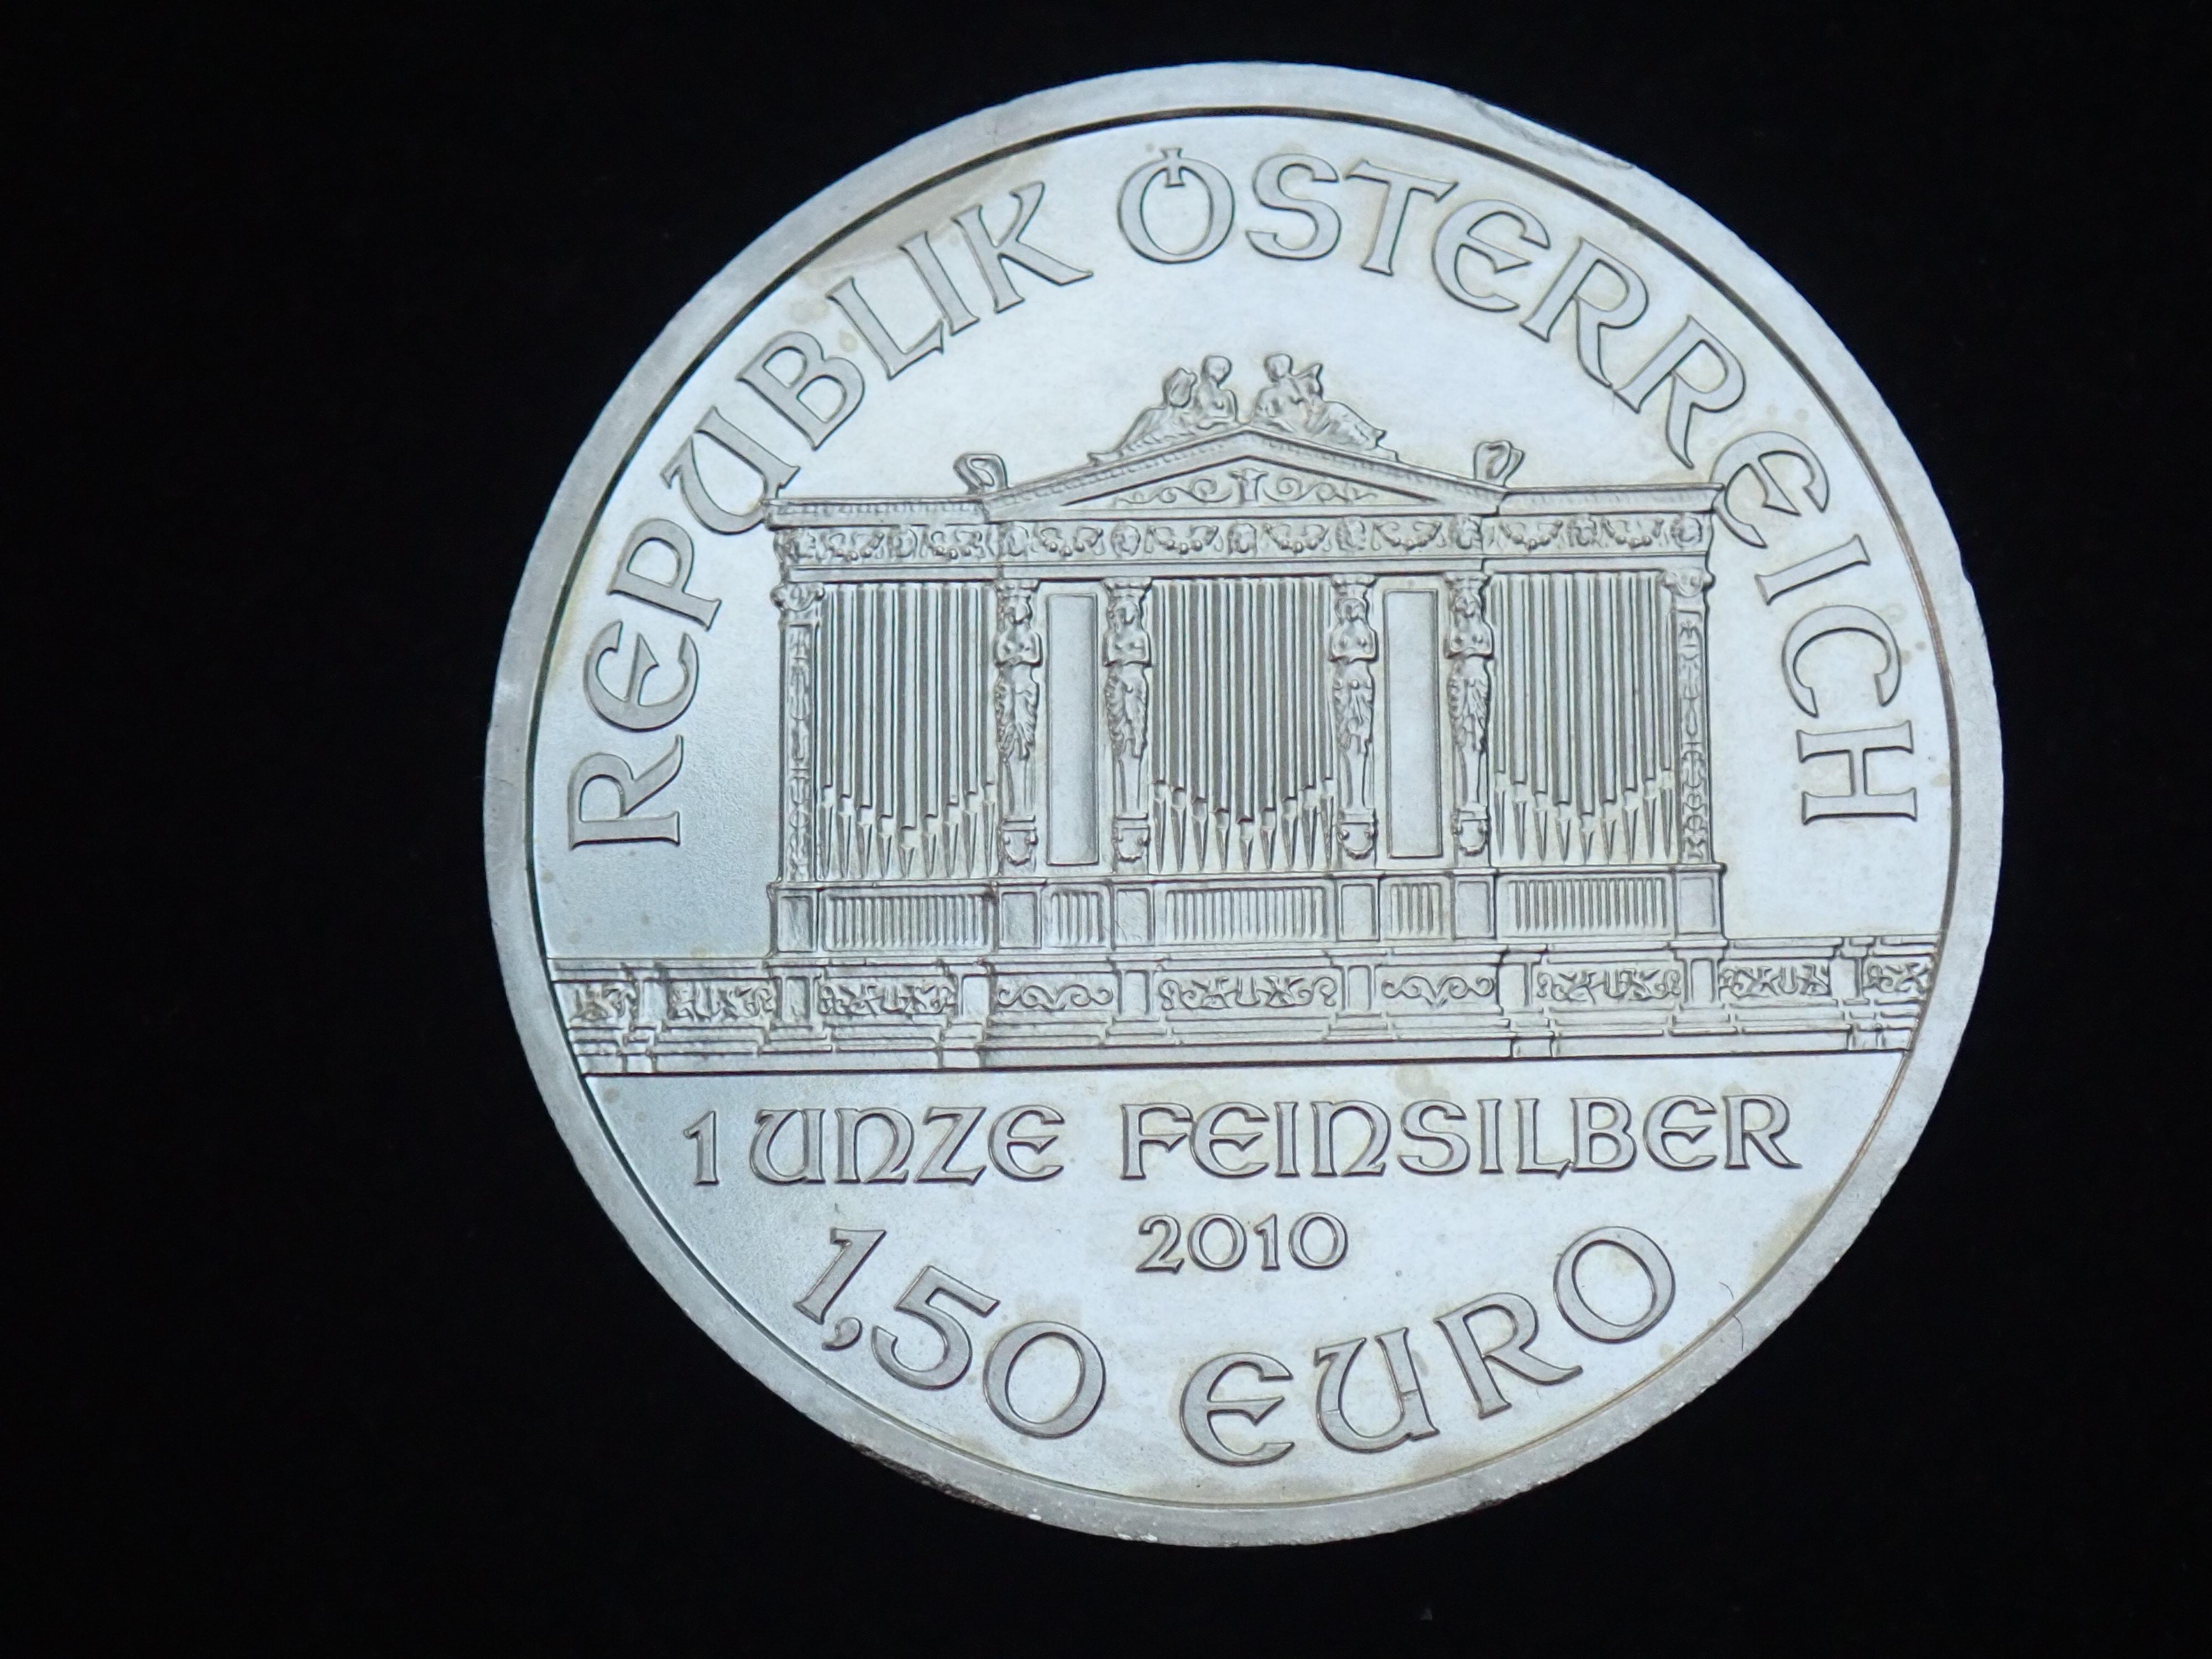 AZZ00580 - 2010 1oz Austrian Philharmonic Fine Silver 999.9 Coin #21